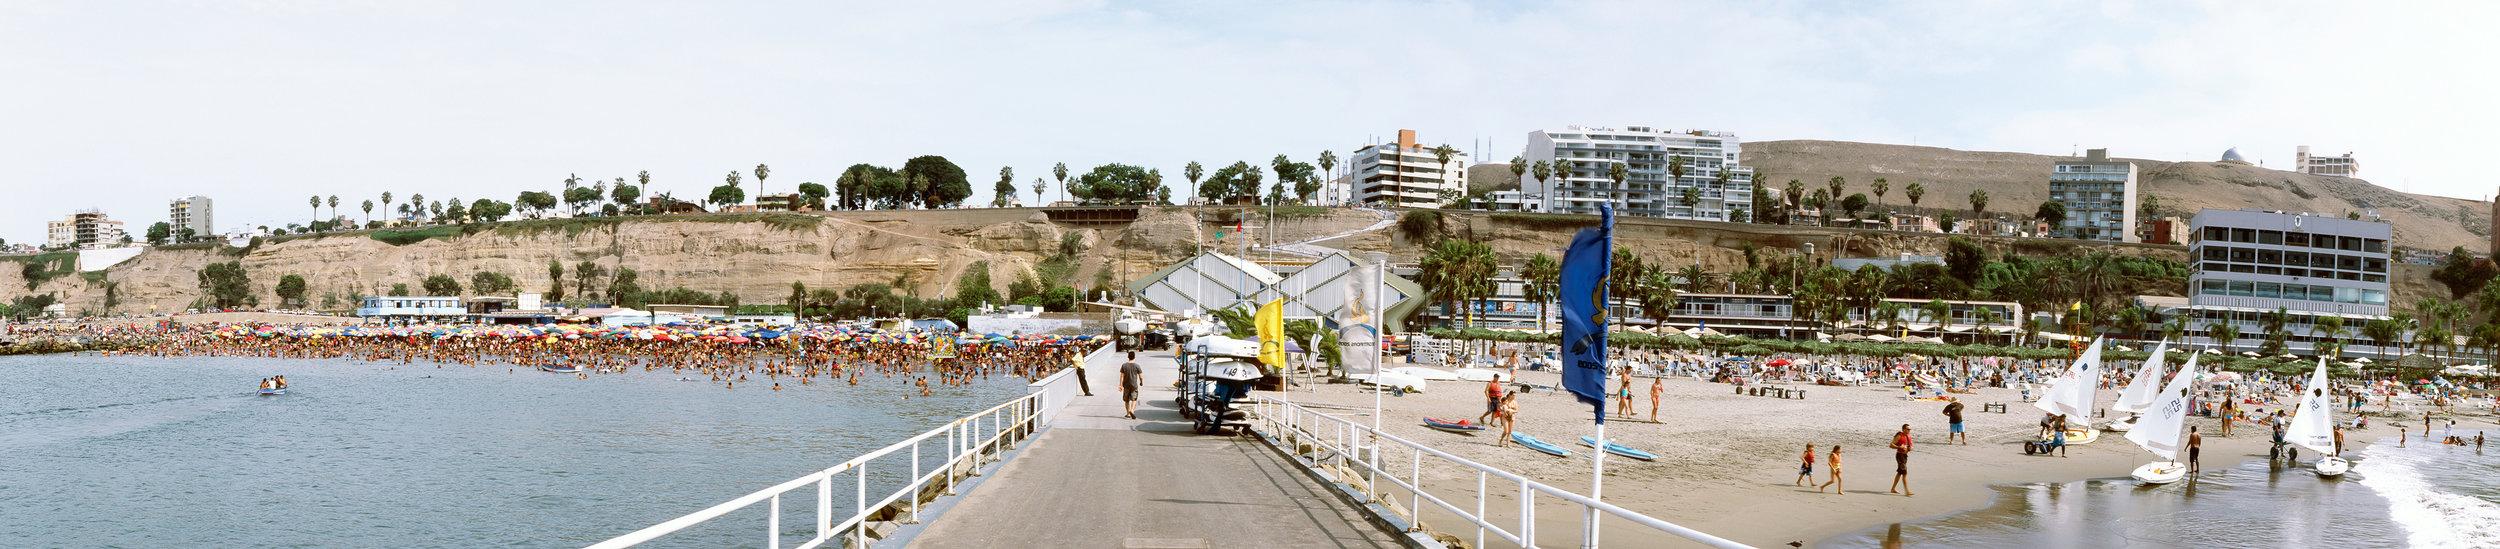 Playa pública - Playa privada, Lima, 2009.